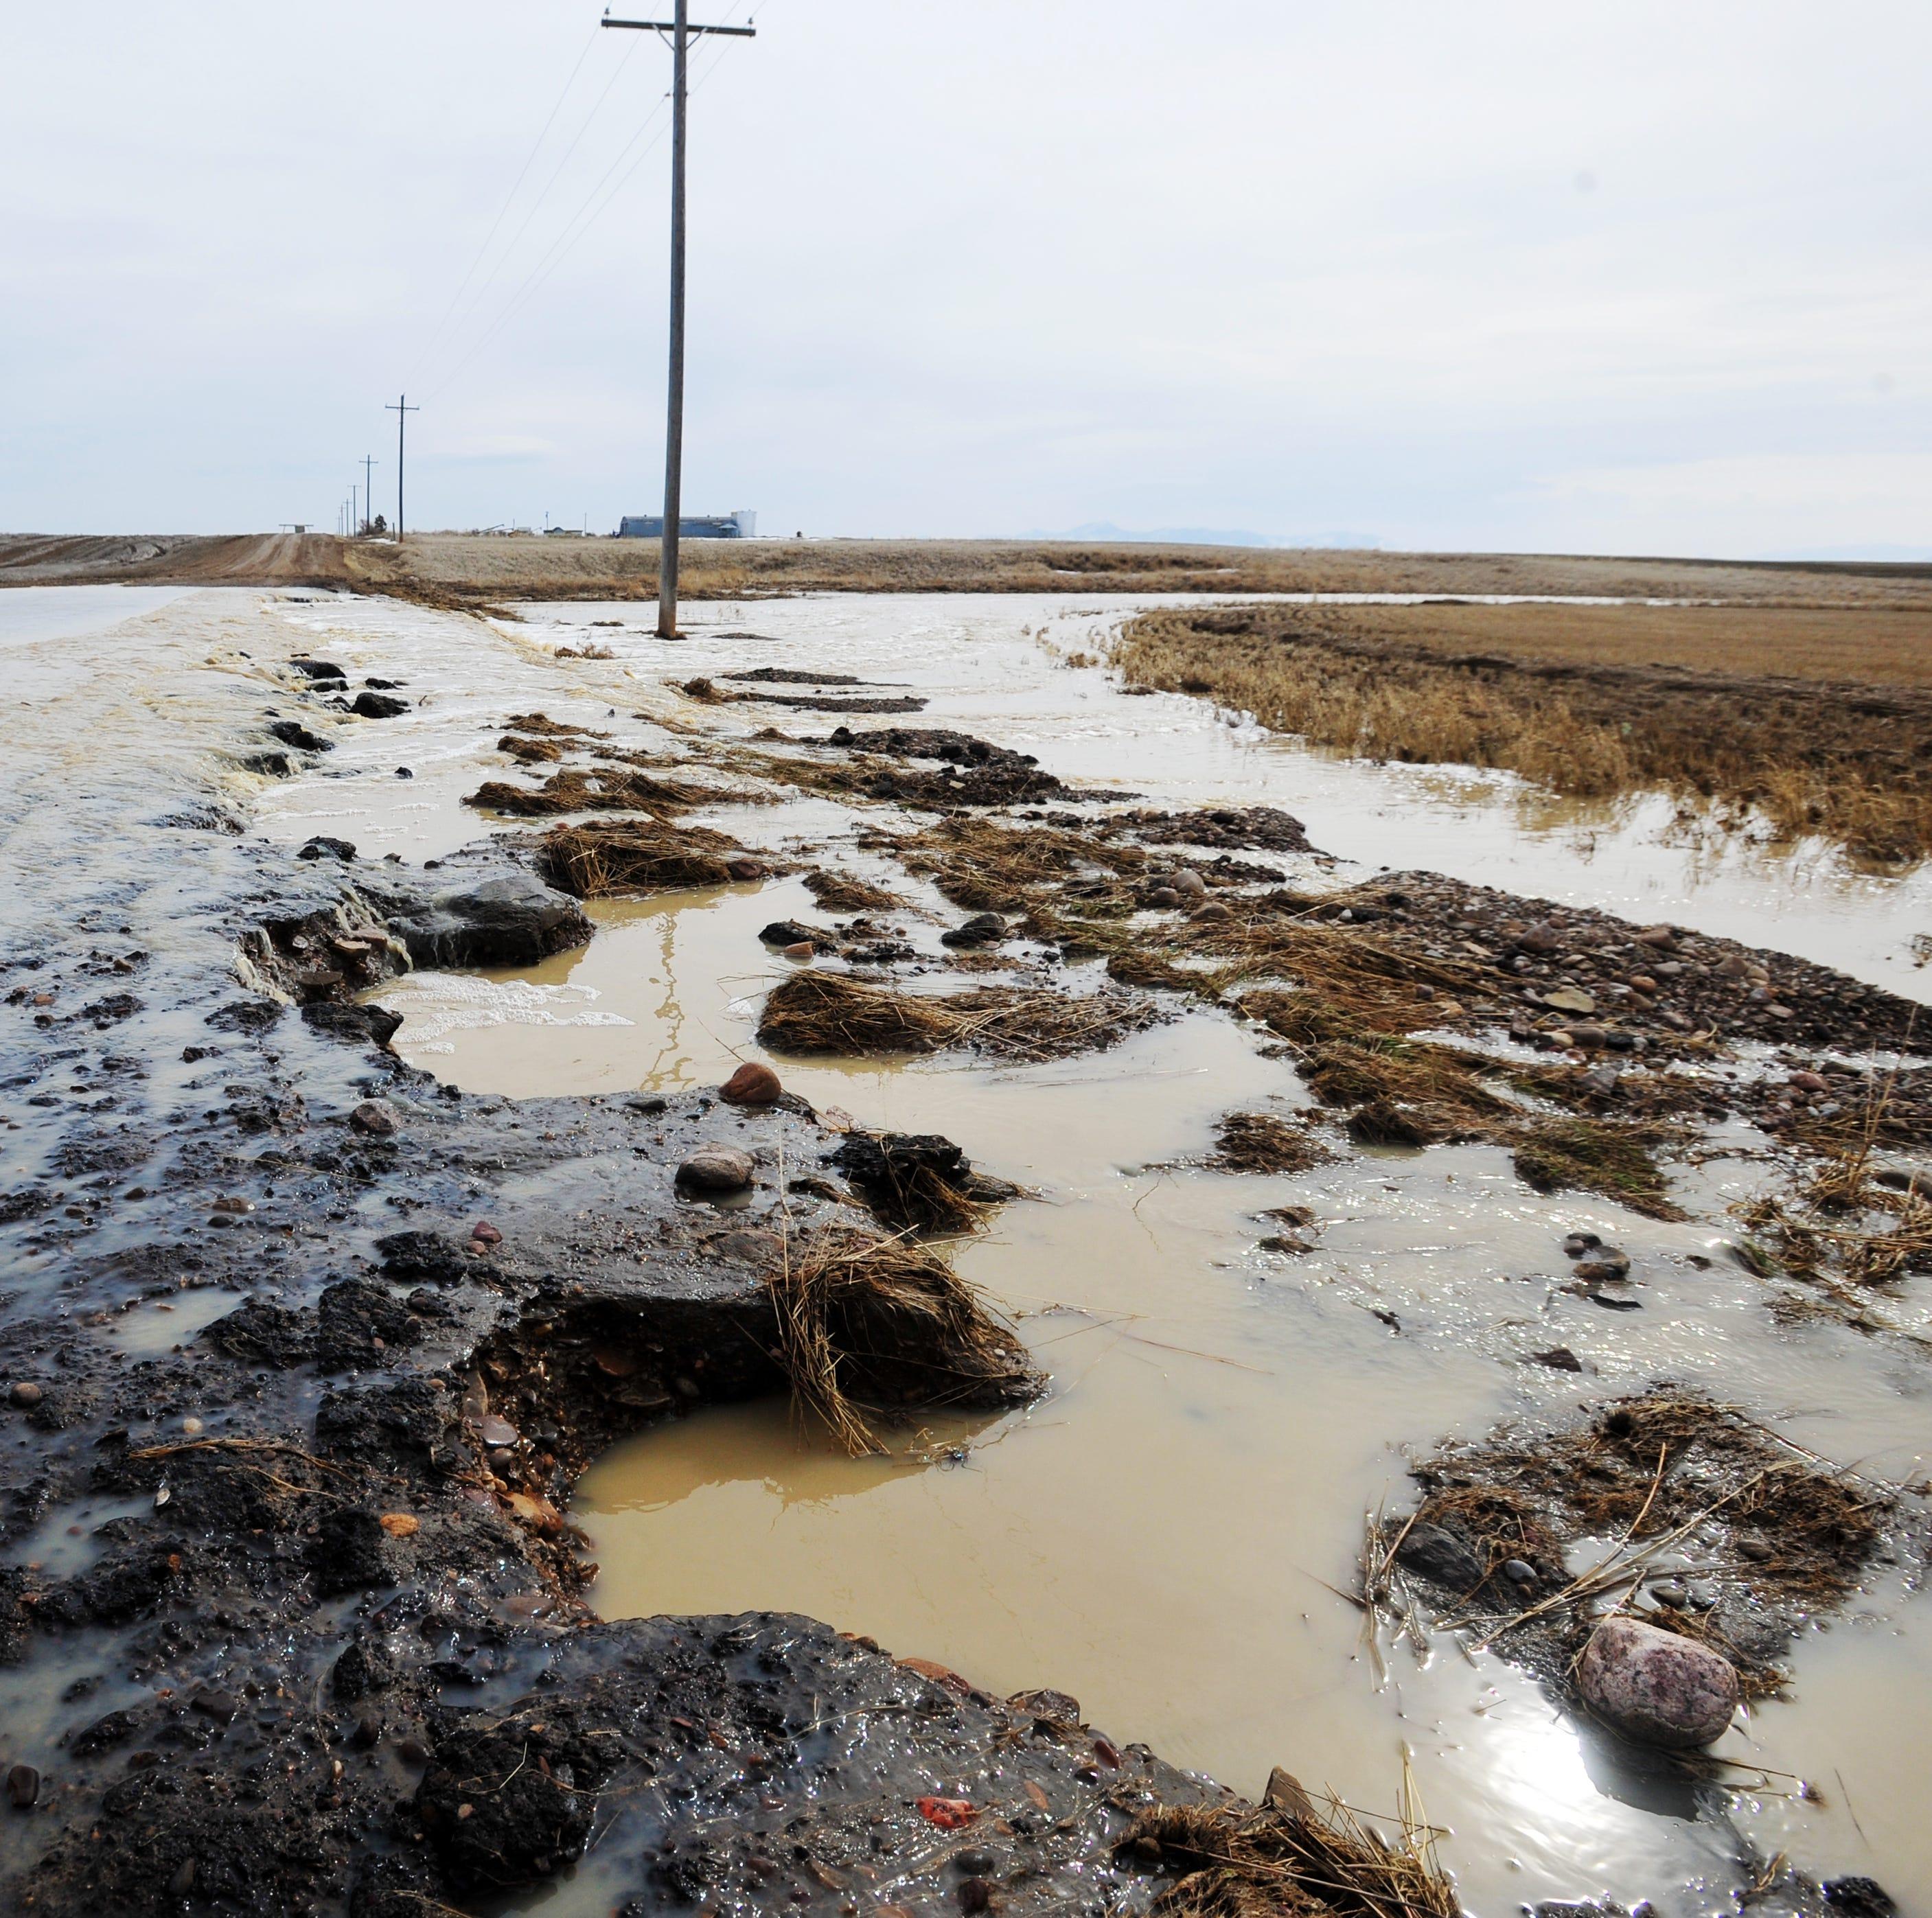 Snowmelt tsunami flows over rural roads, fields